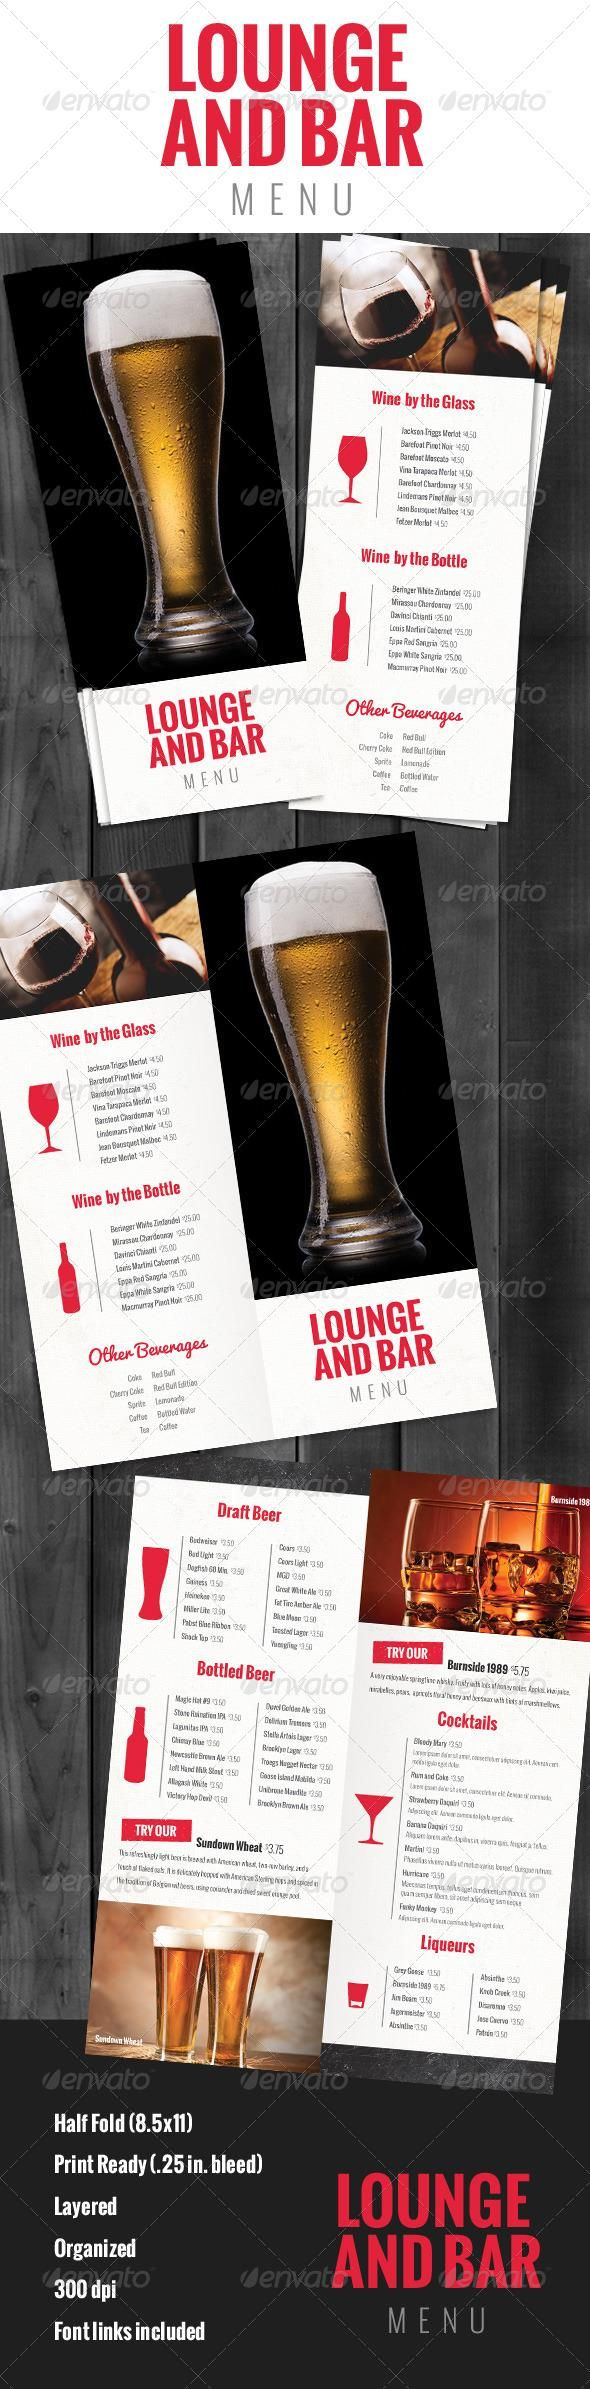 Best Food Menu Template Images On Pinterest Food Menu Template - Bar drink menu template free